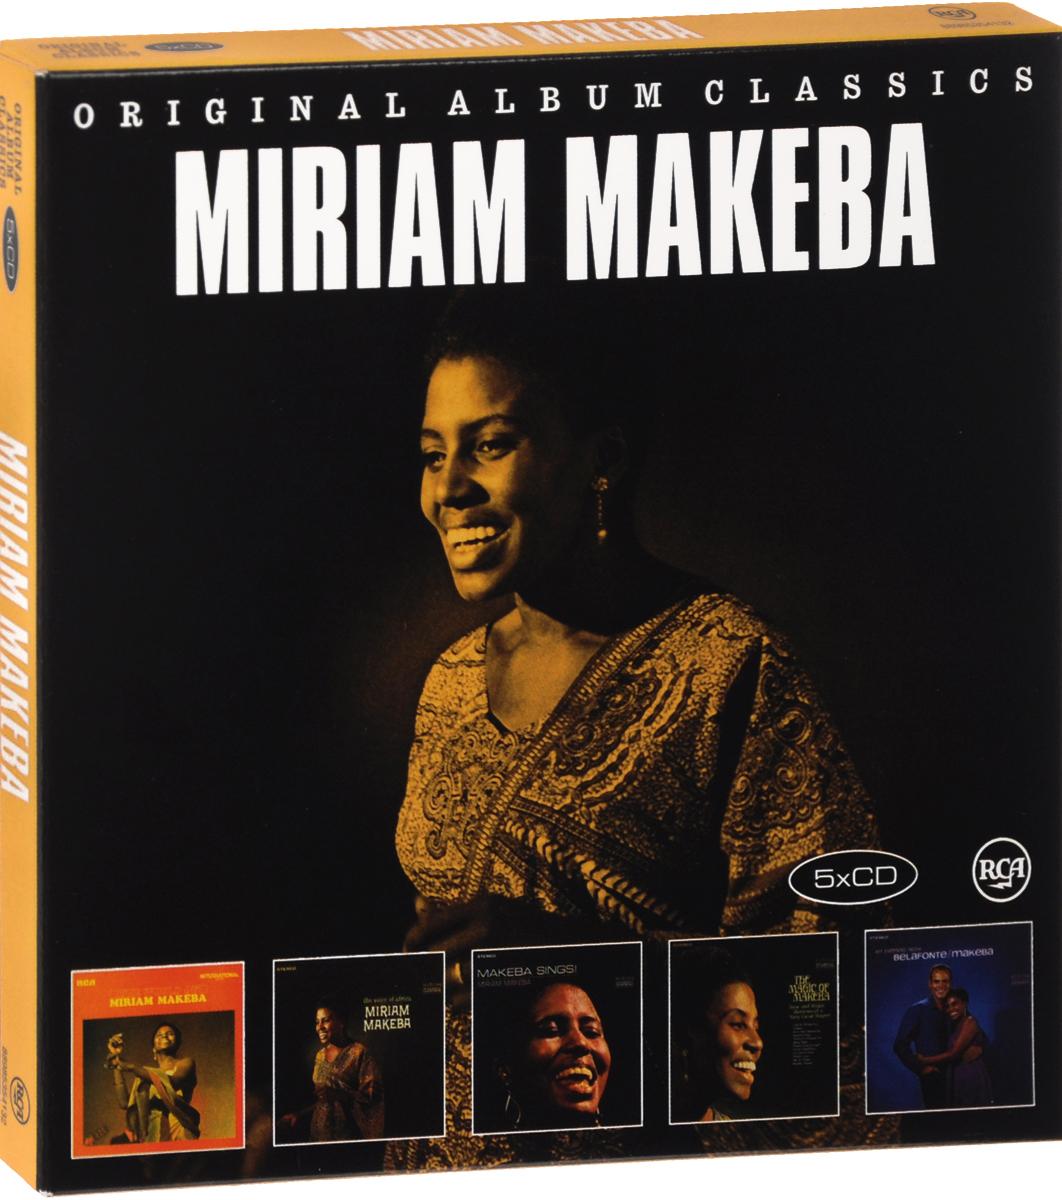 Мириам Макеба,Гарри Белафонте Miriam Makeba. Original Album Classics (5 CD) гарри белафонте мириам макеба harry belafonte miriam makeba an evening with belafonte makeba